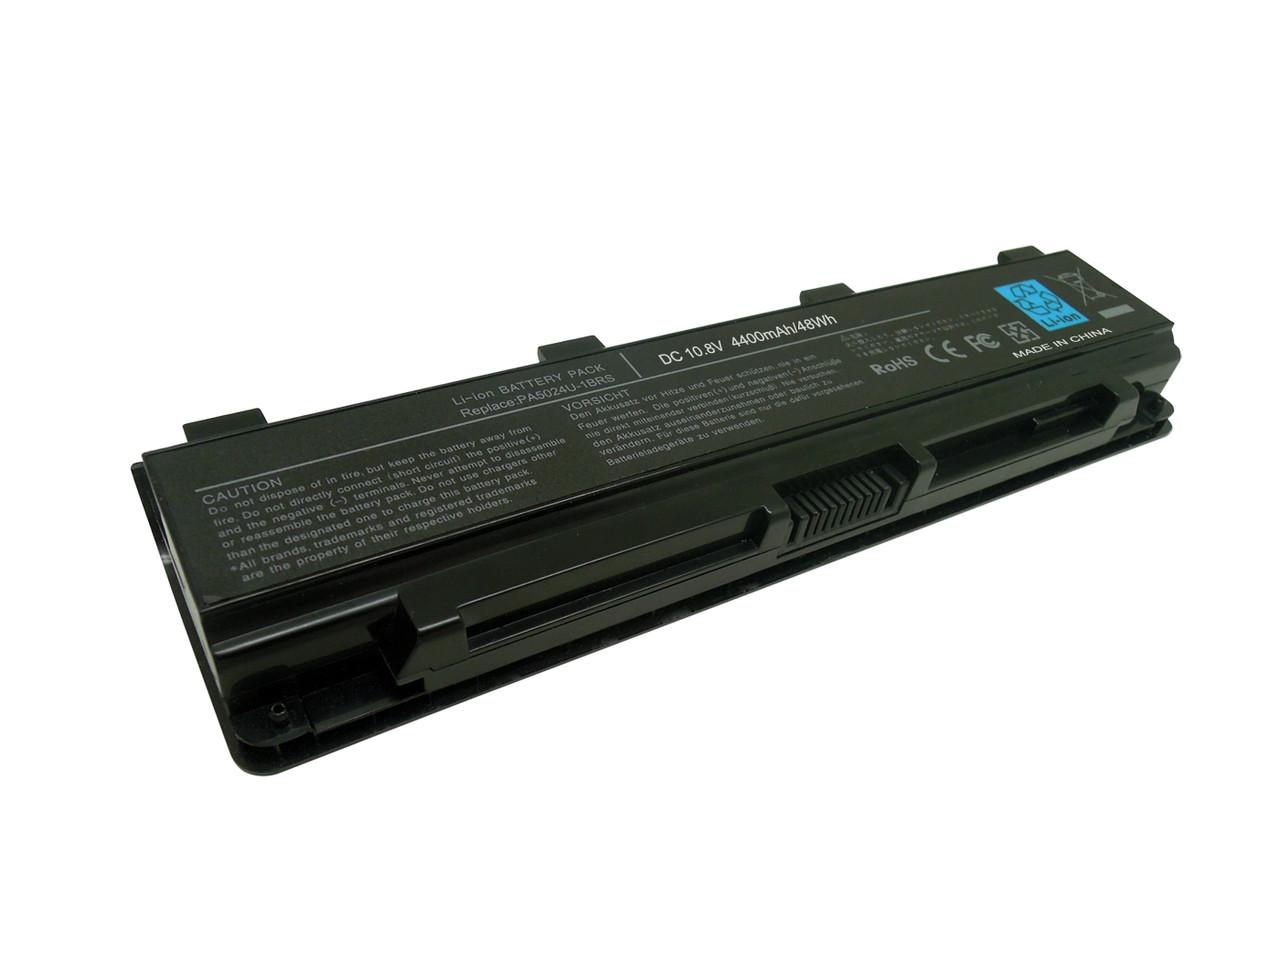 Аккумулятор для ноутбука TOSHIBA SATELLITE P845D